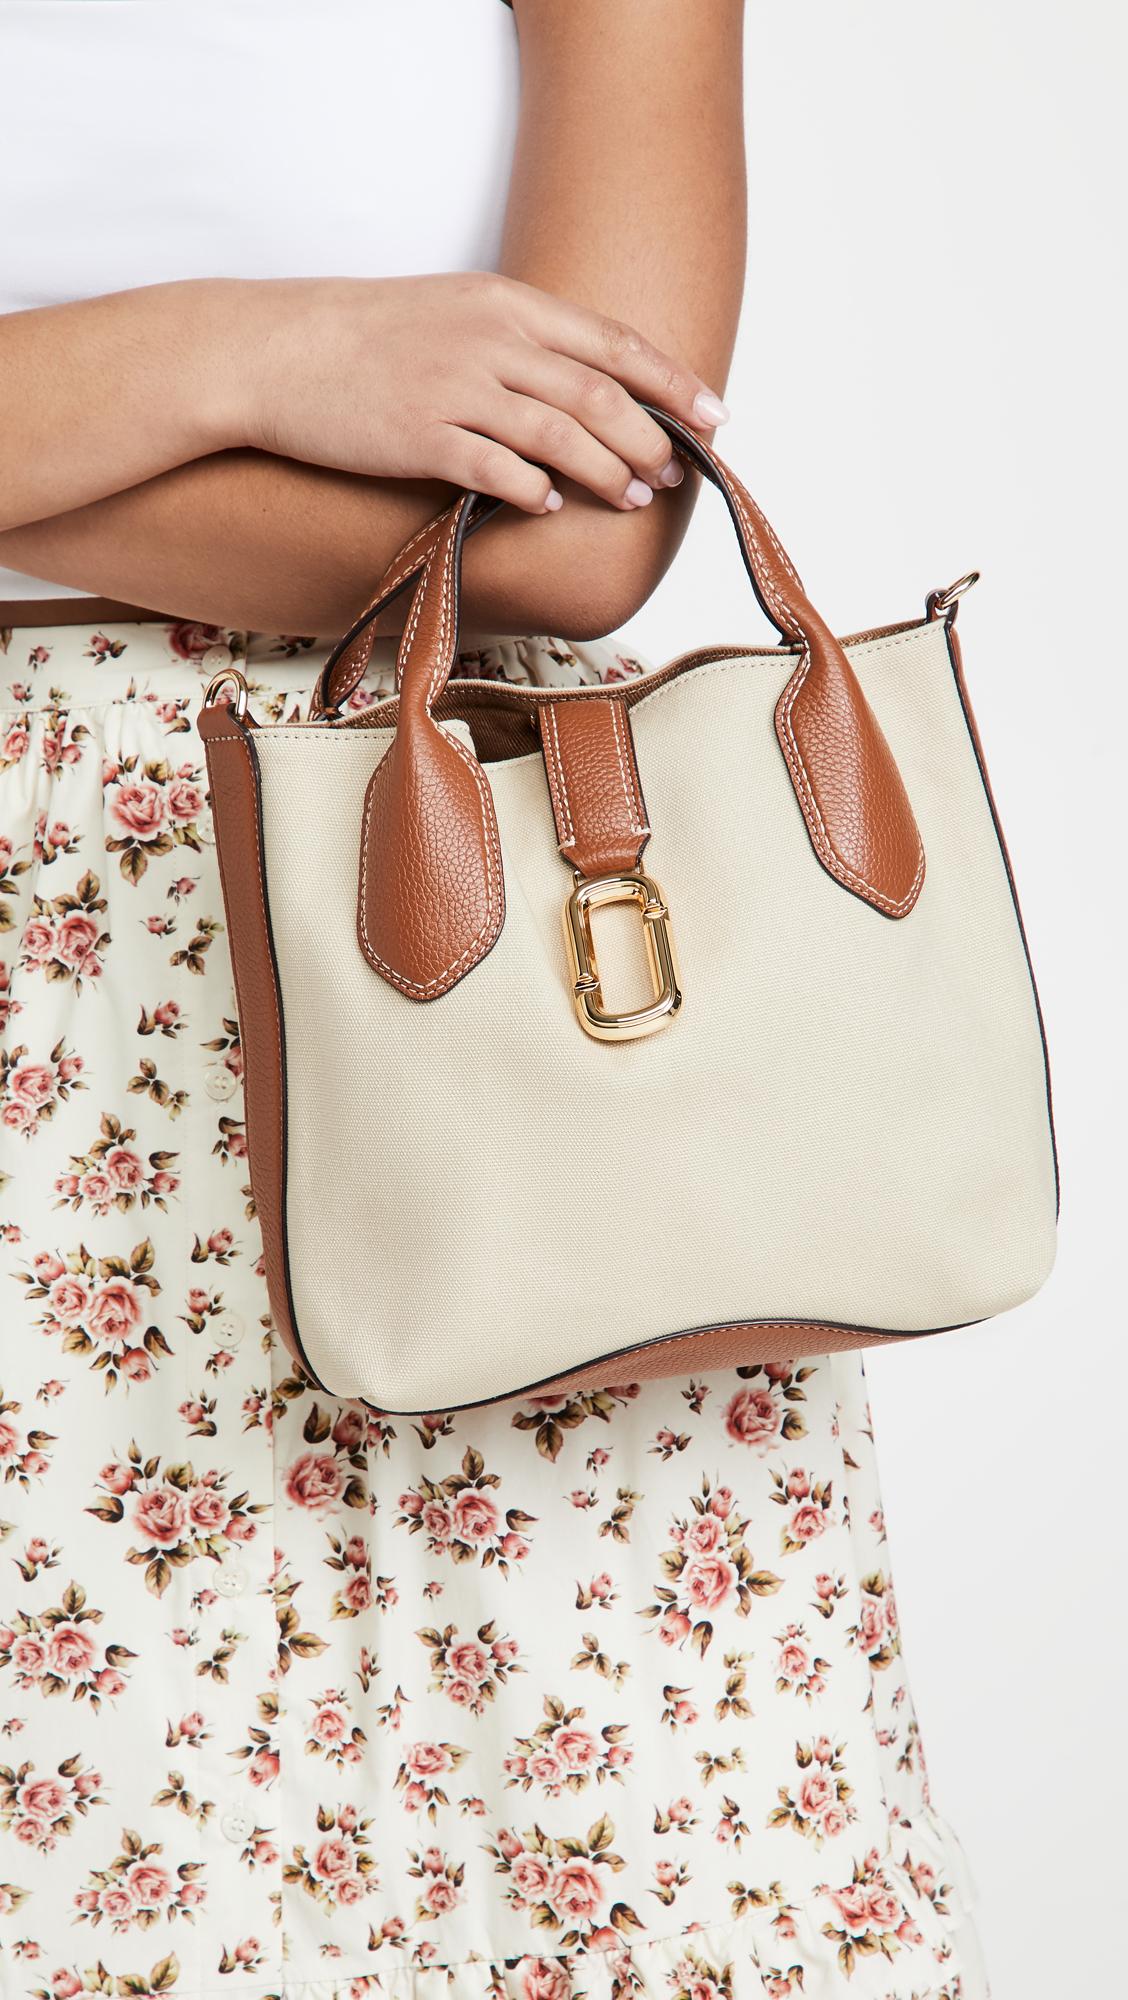 The Marc Jacobs Crossbody Bag